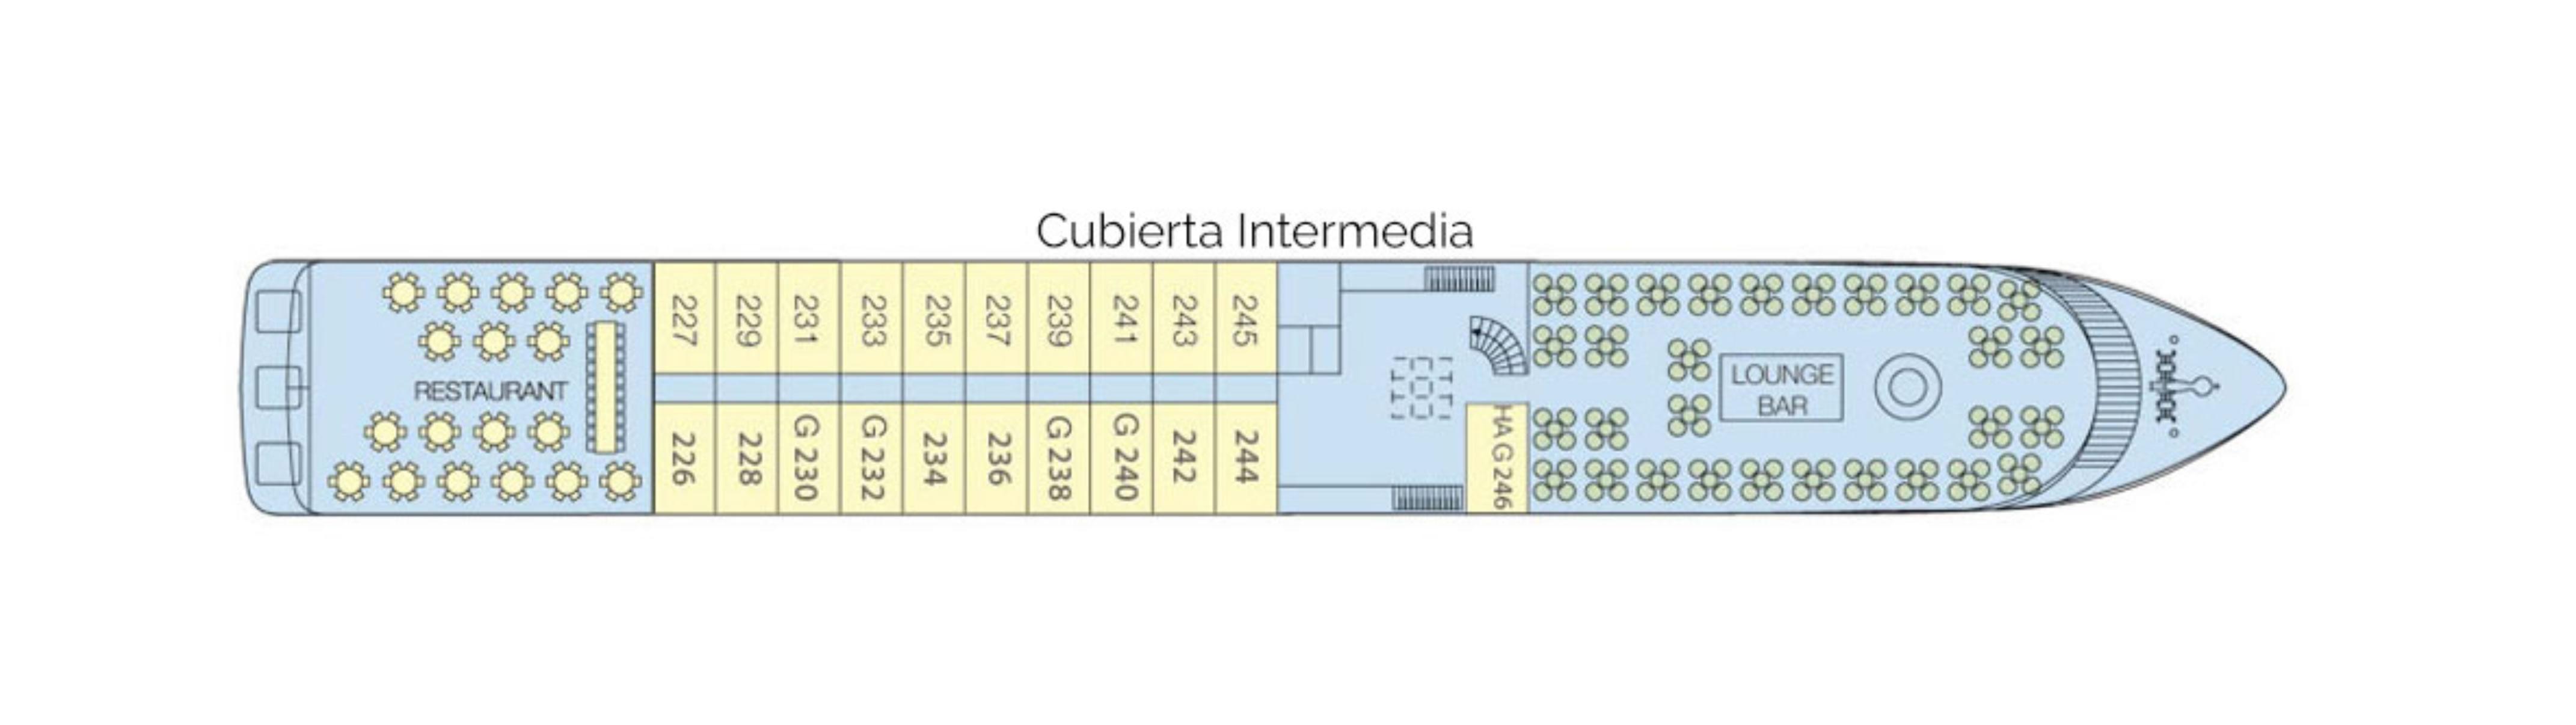 Cubierta Intermedia